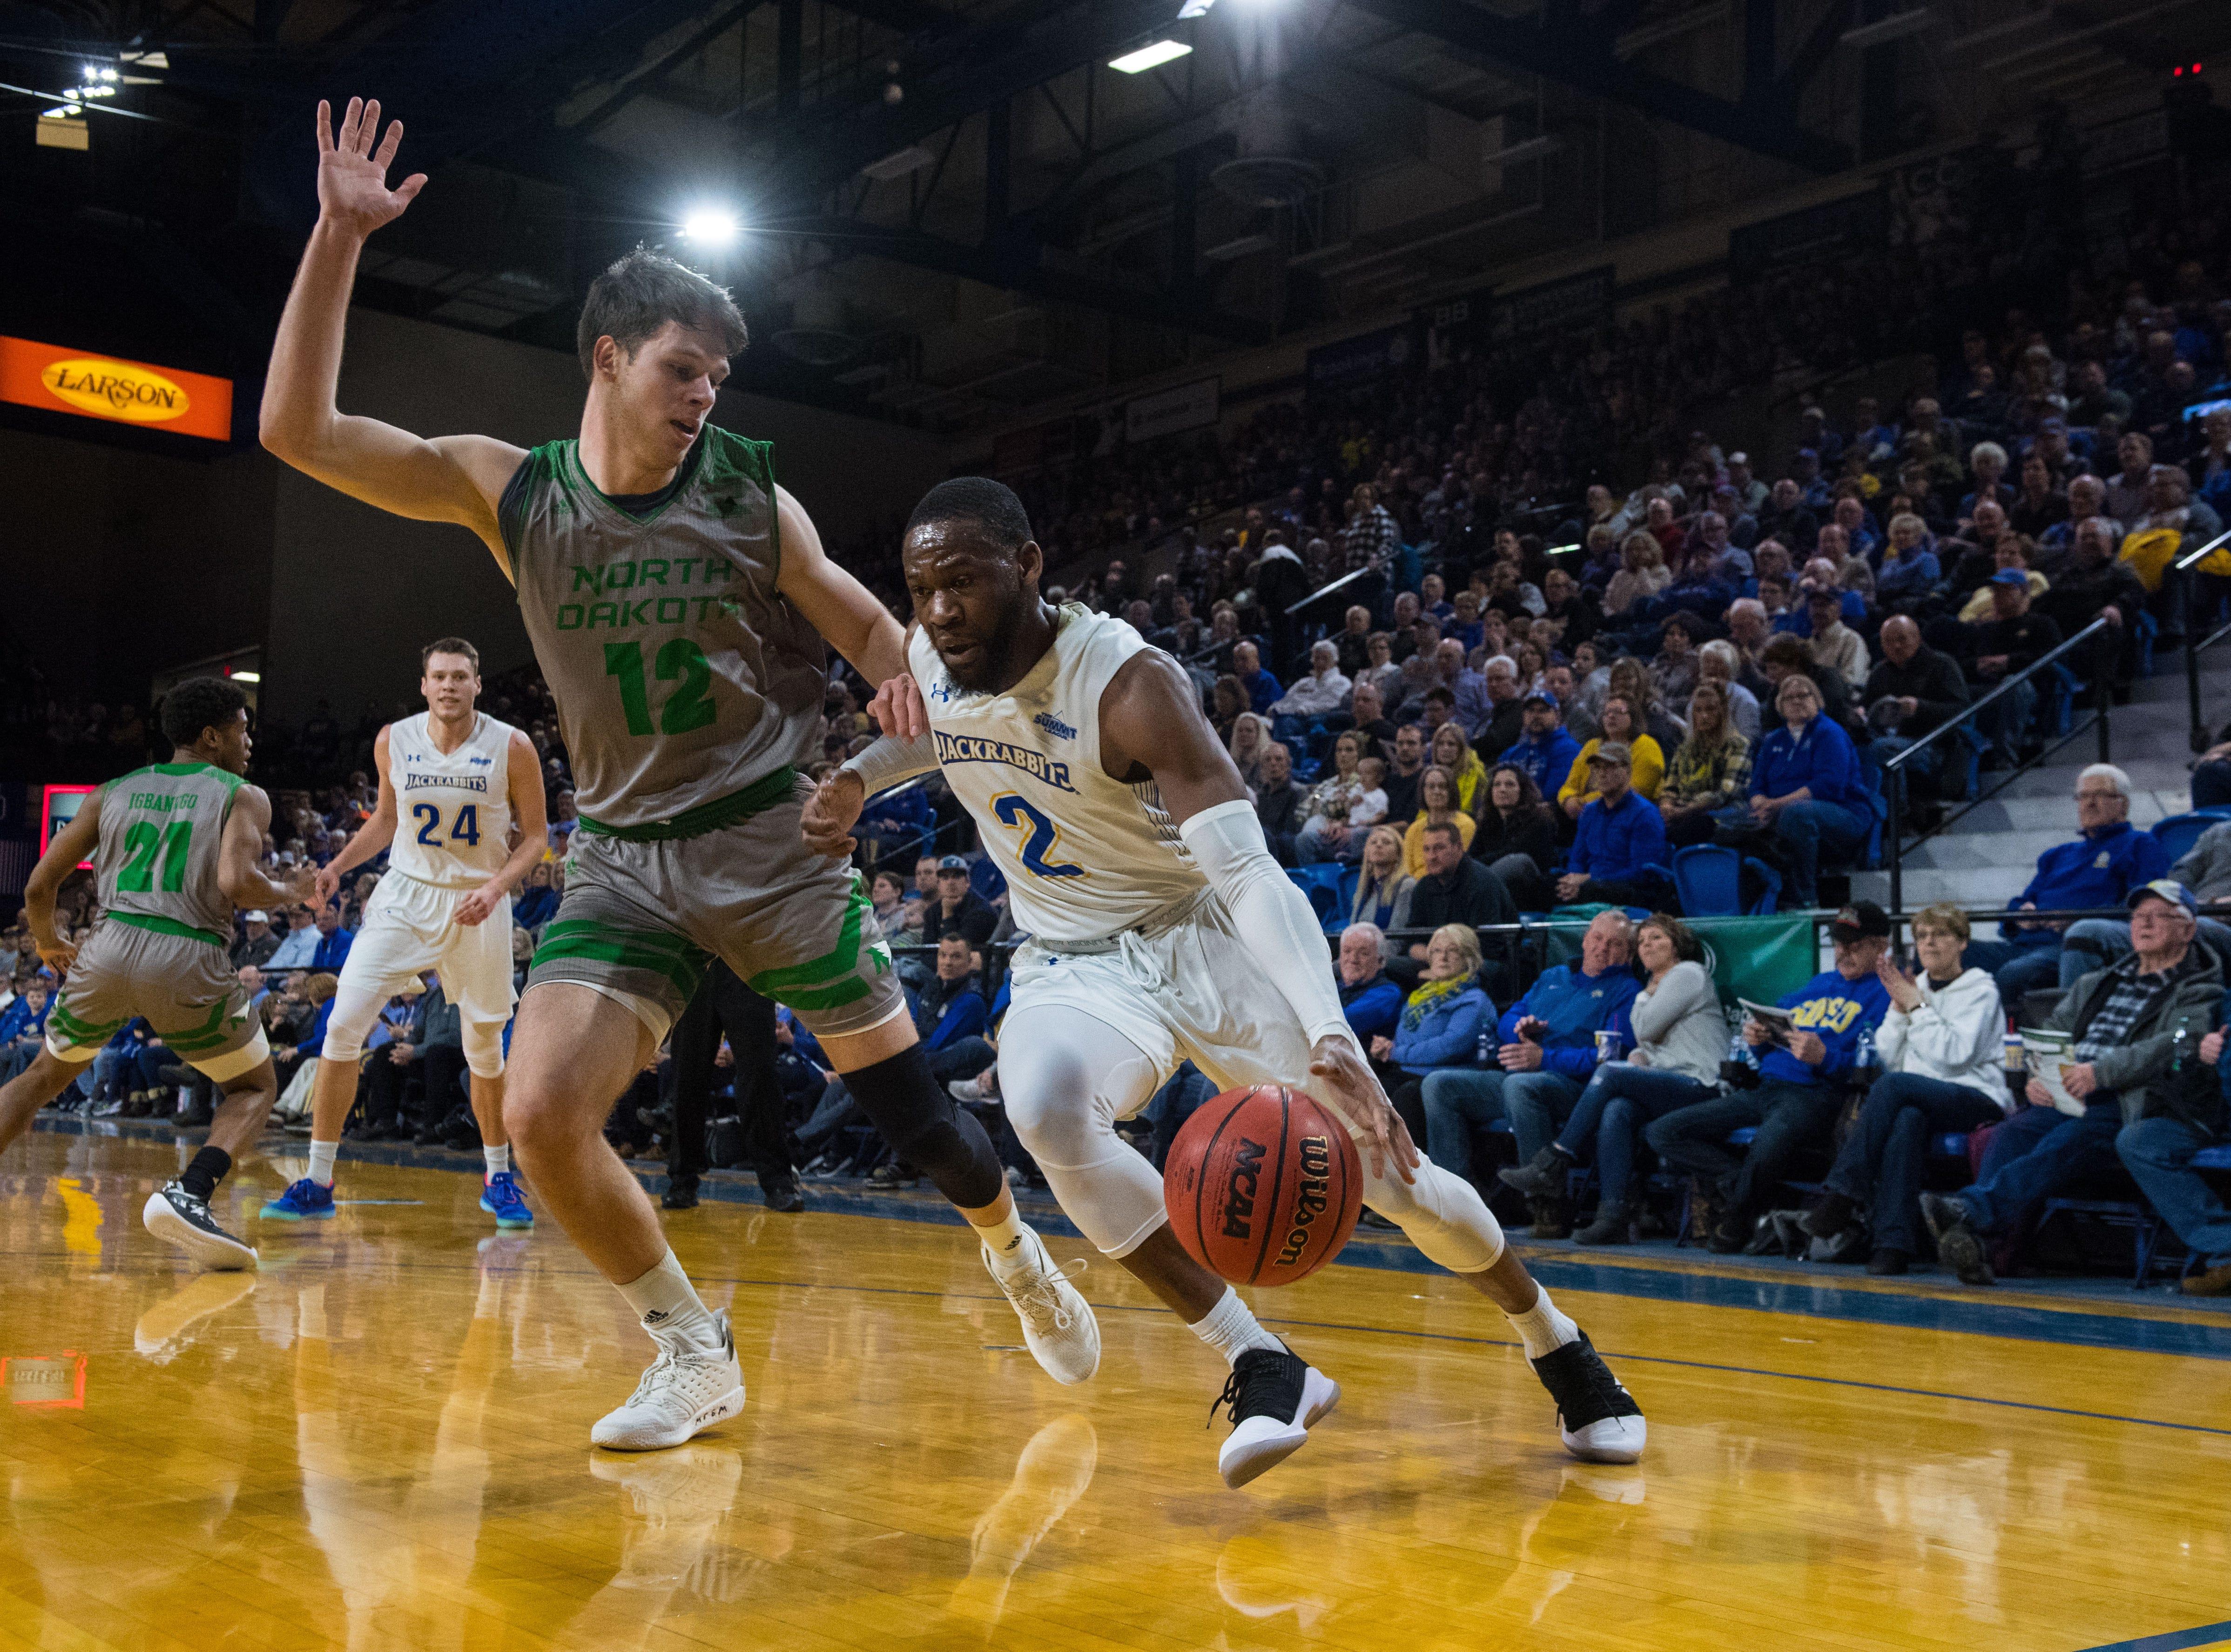 South Dakota State's Tevin King (2) dribbles the ball past North Dakota's Filip Rebraca (12) during a game in Brookings, S.D., Saturday, Feb. 9, 2019.